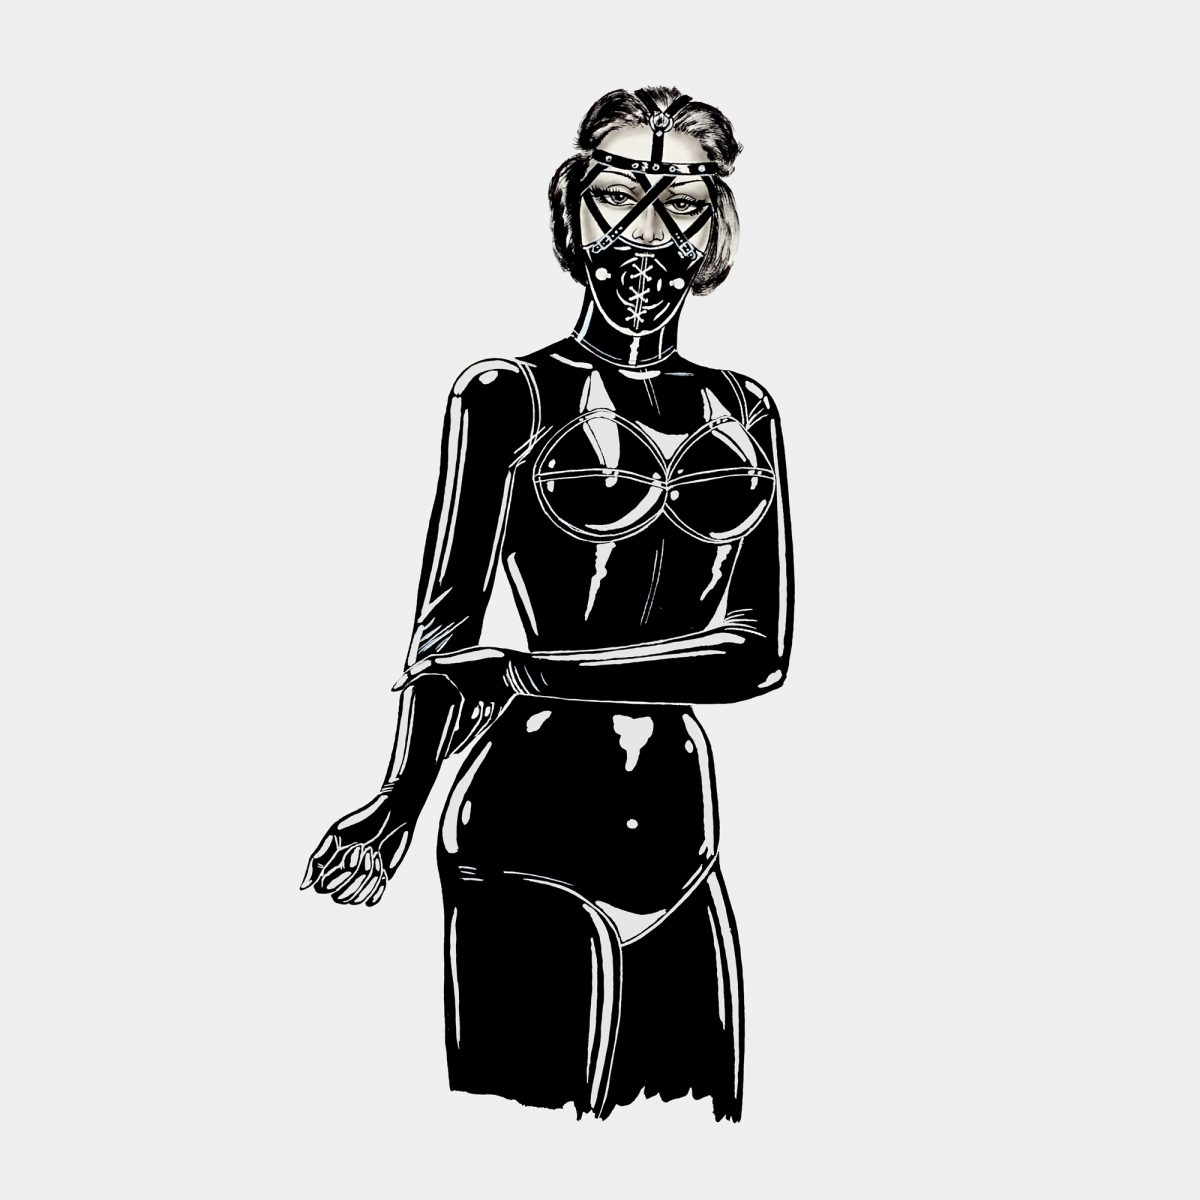 the-eyes-a4-portrait-kink-bdsm-wall-art-born-in-black